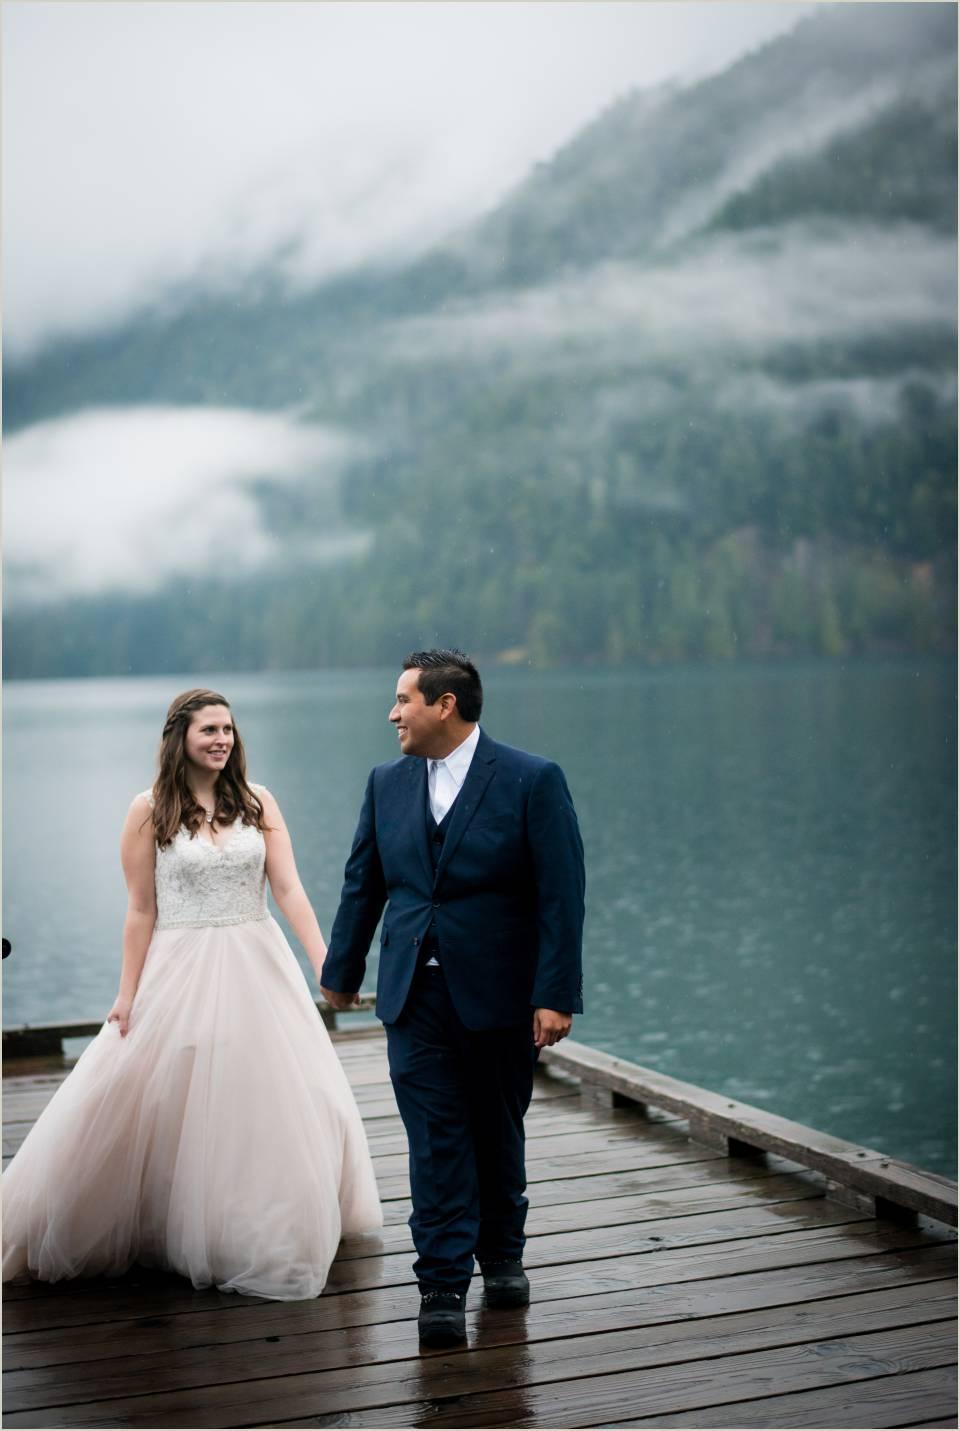 couple walking on dock at lake crescent 1